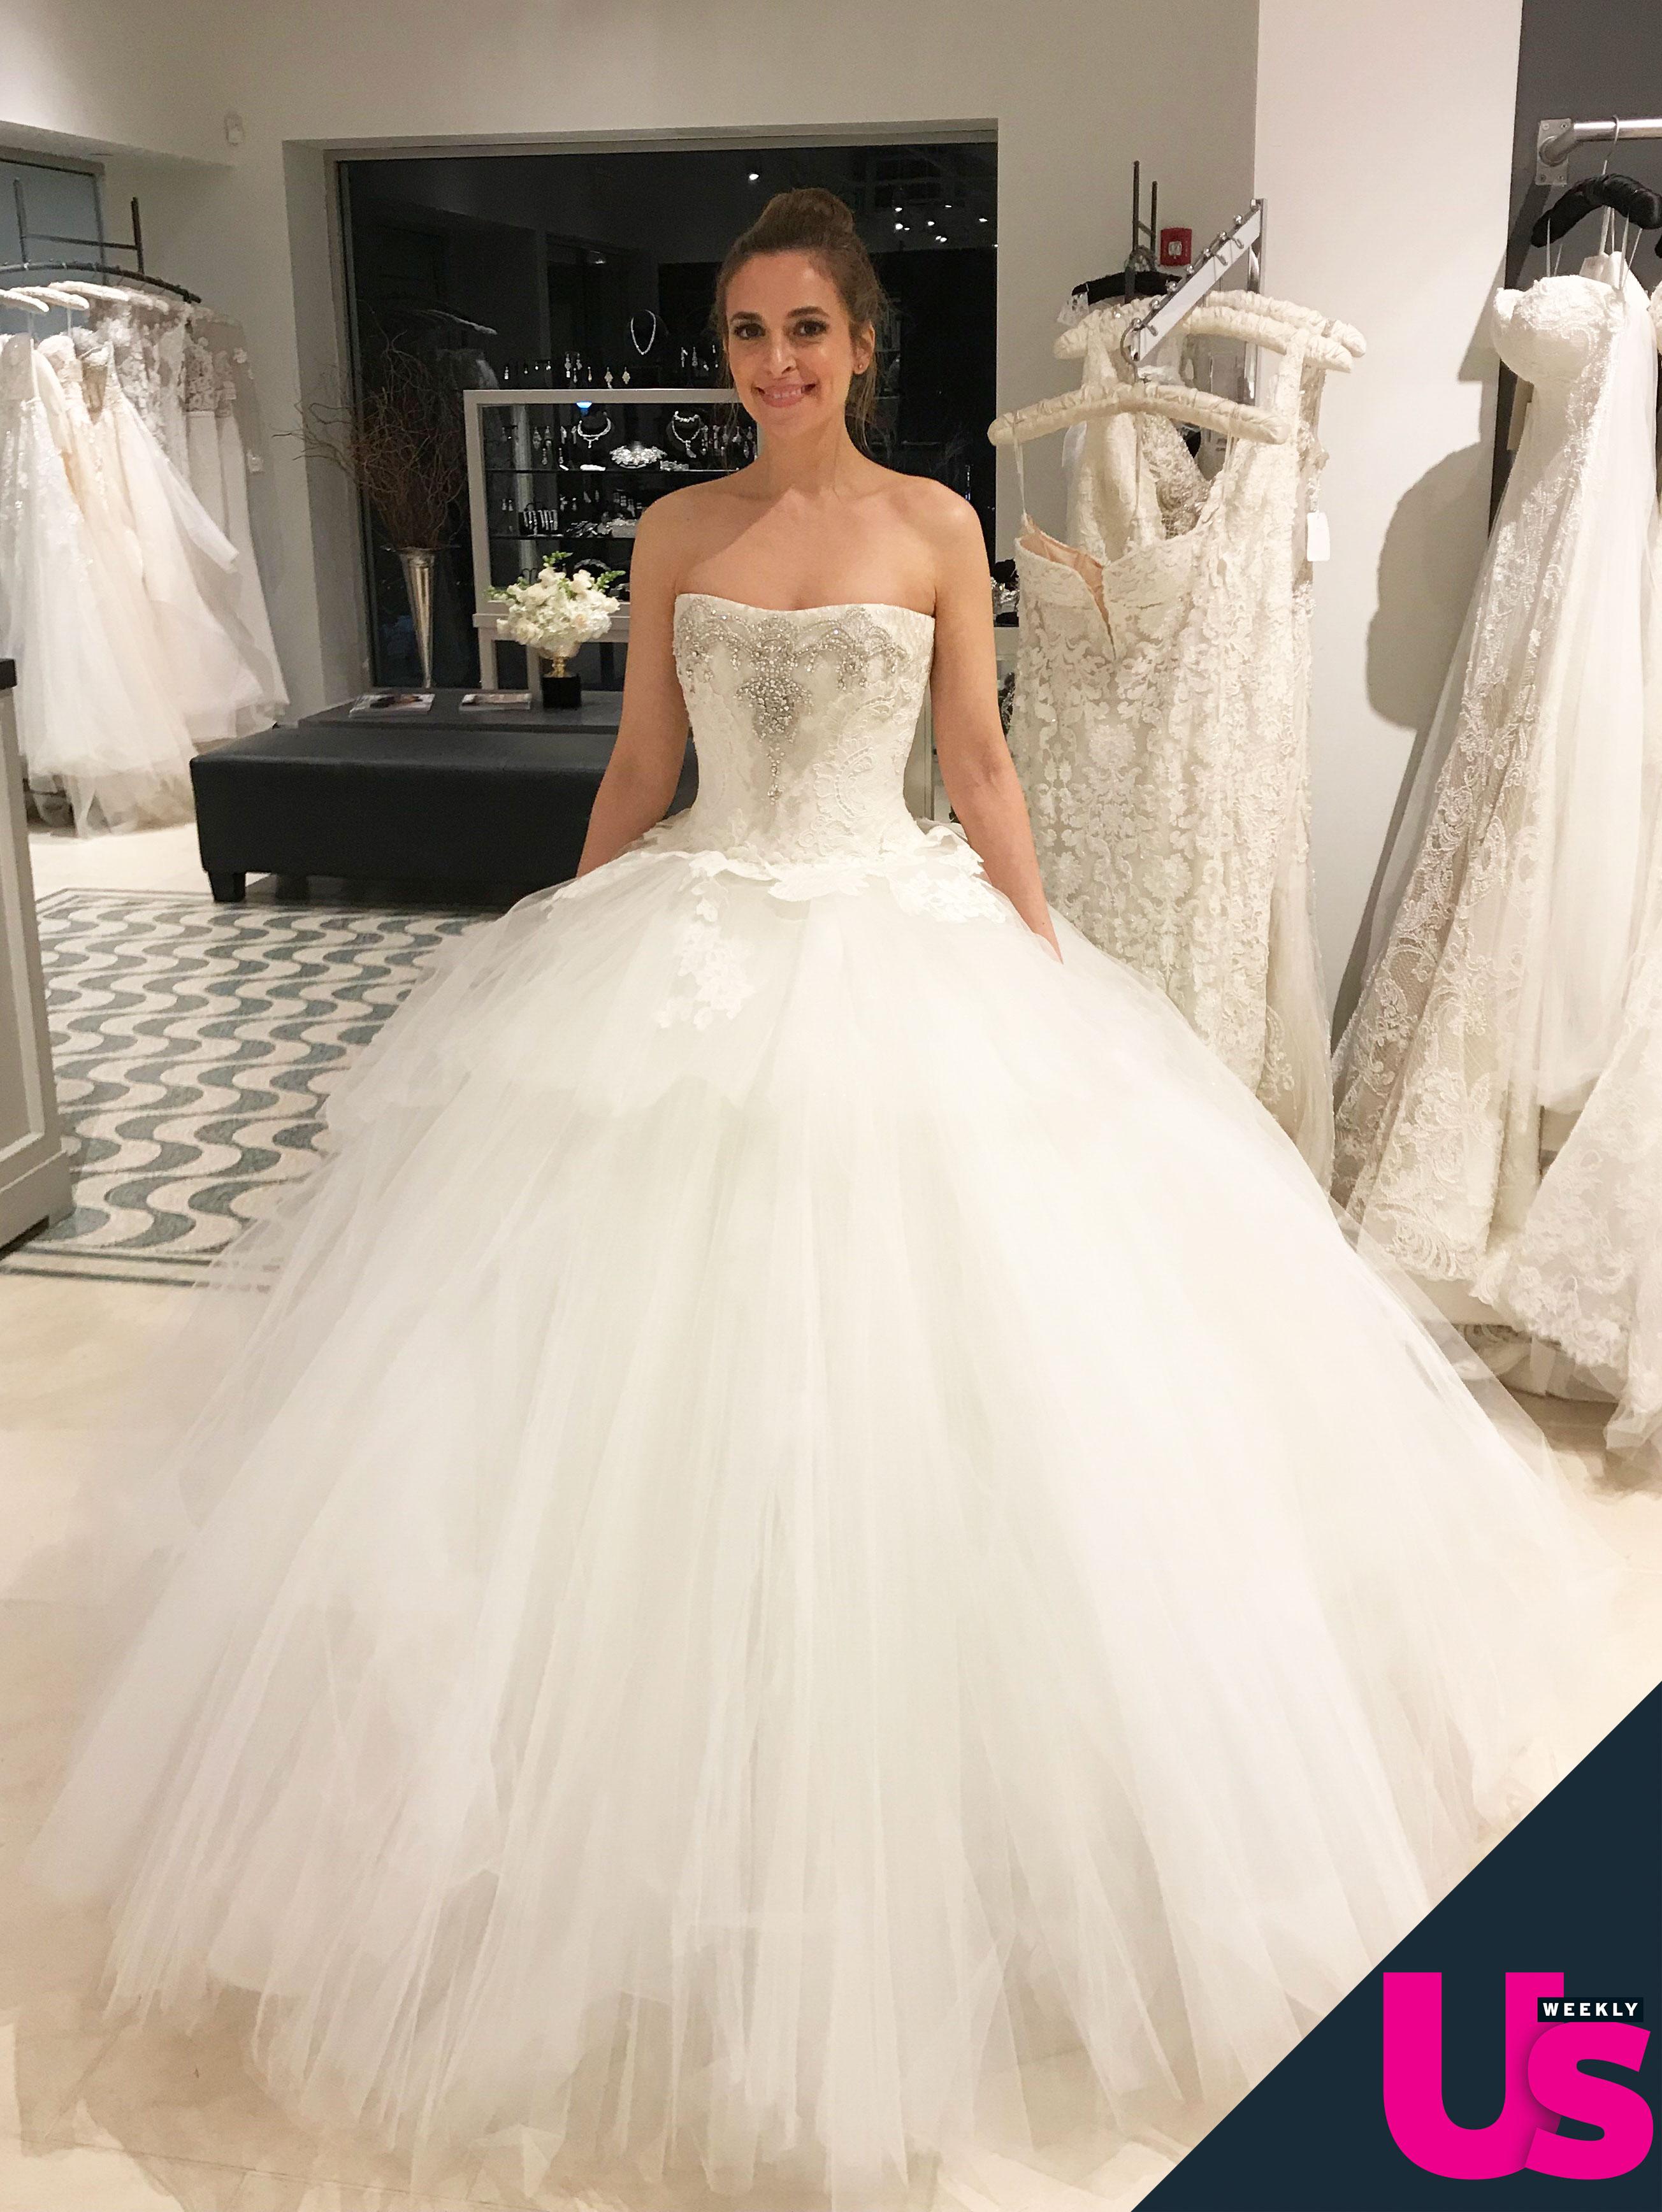 Jedediah Bila Goes Wedding Dress Shopping Details